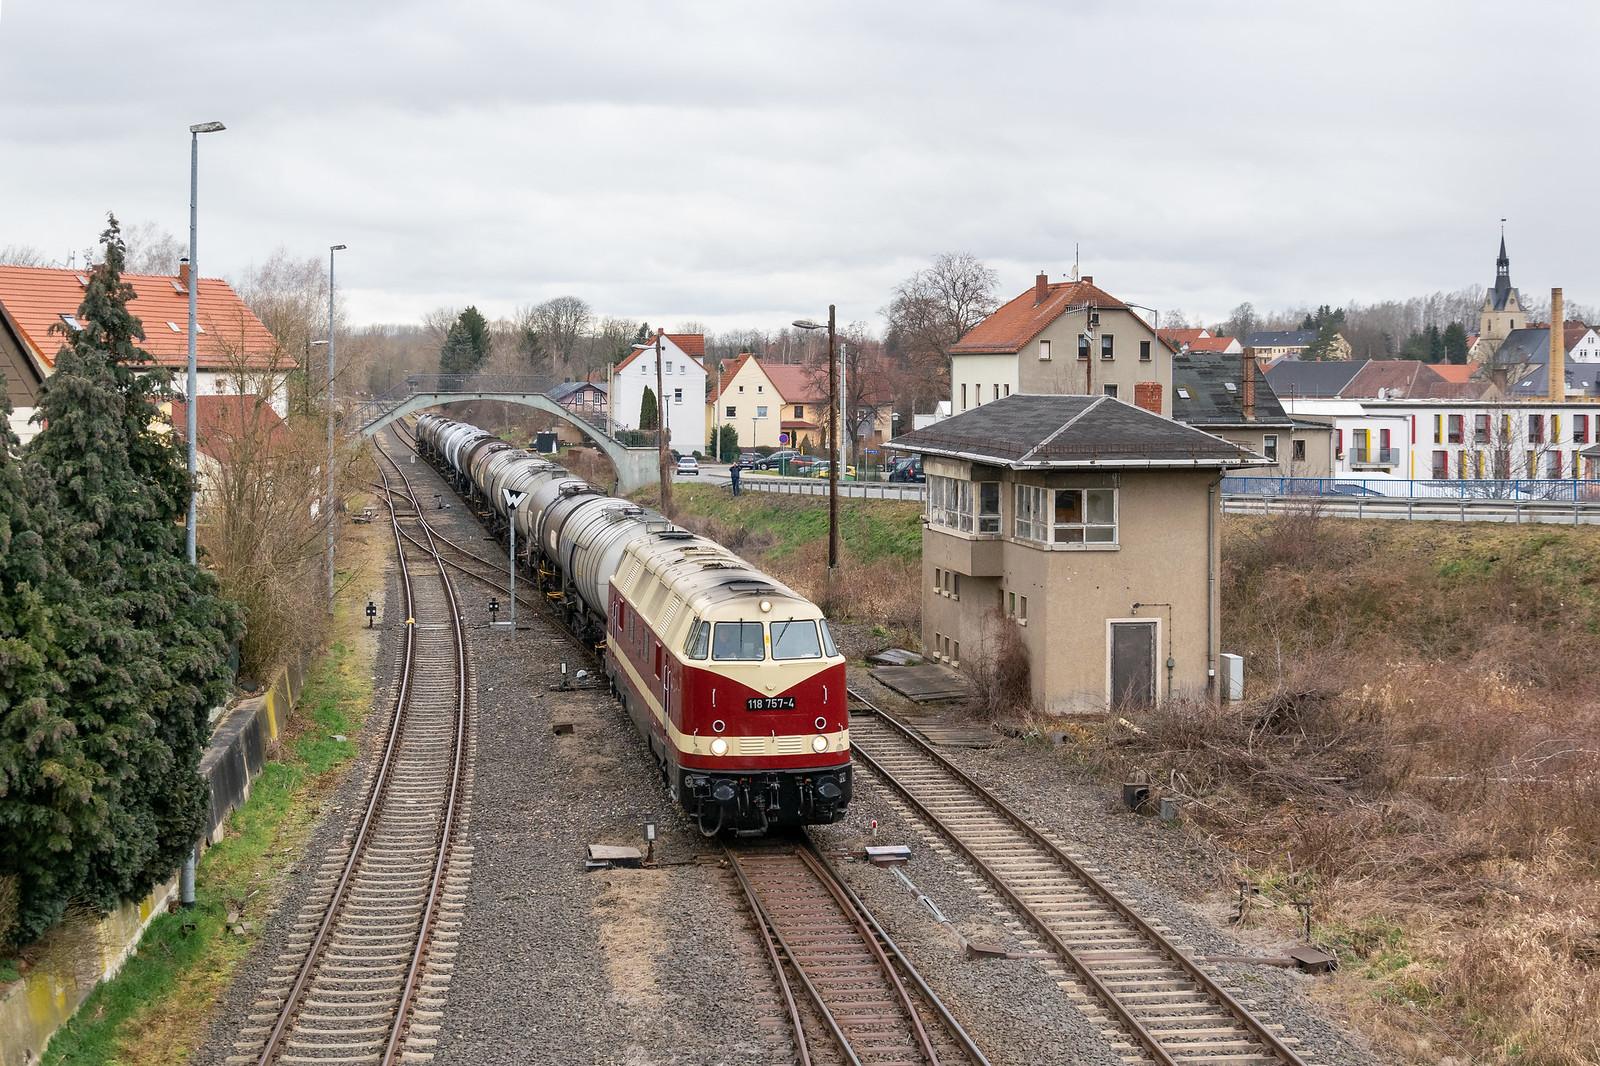 118 757 in Rositz